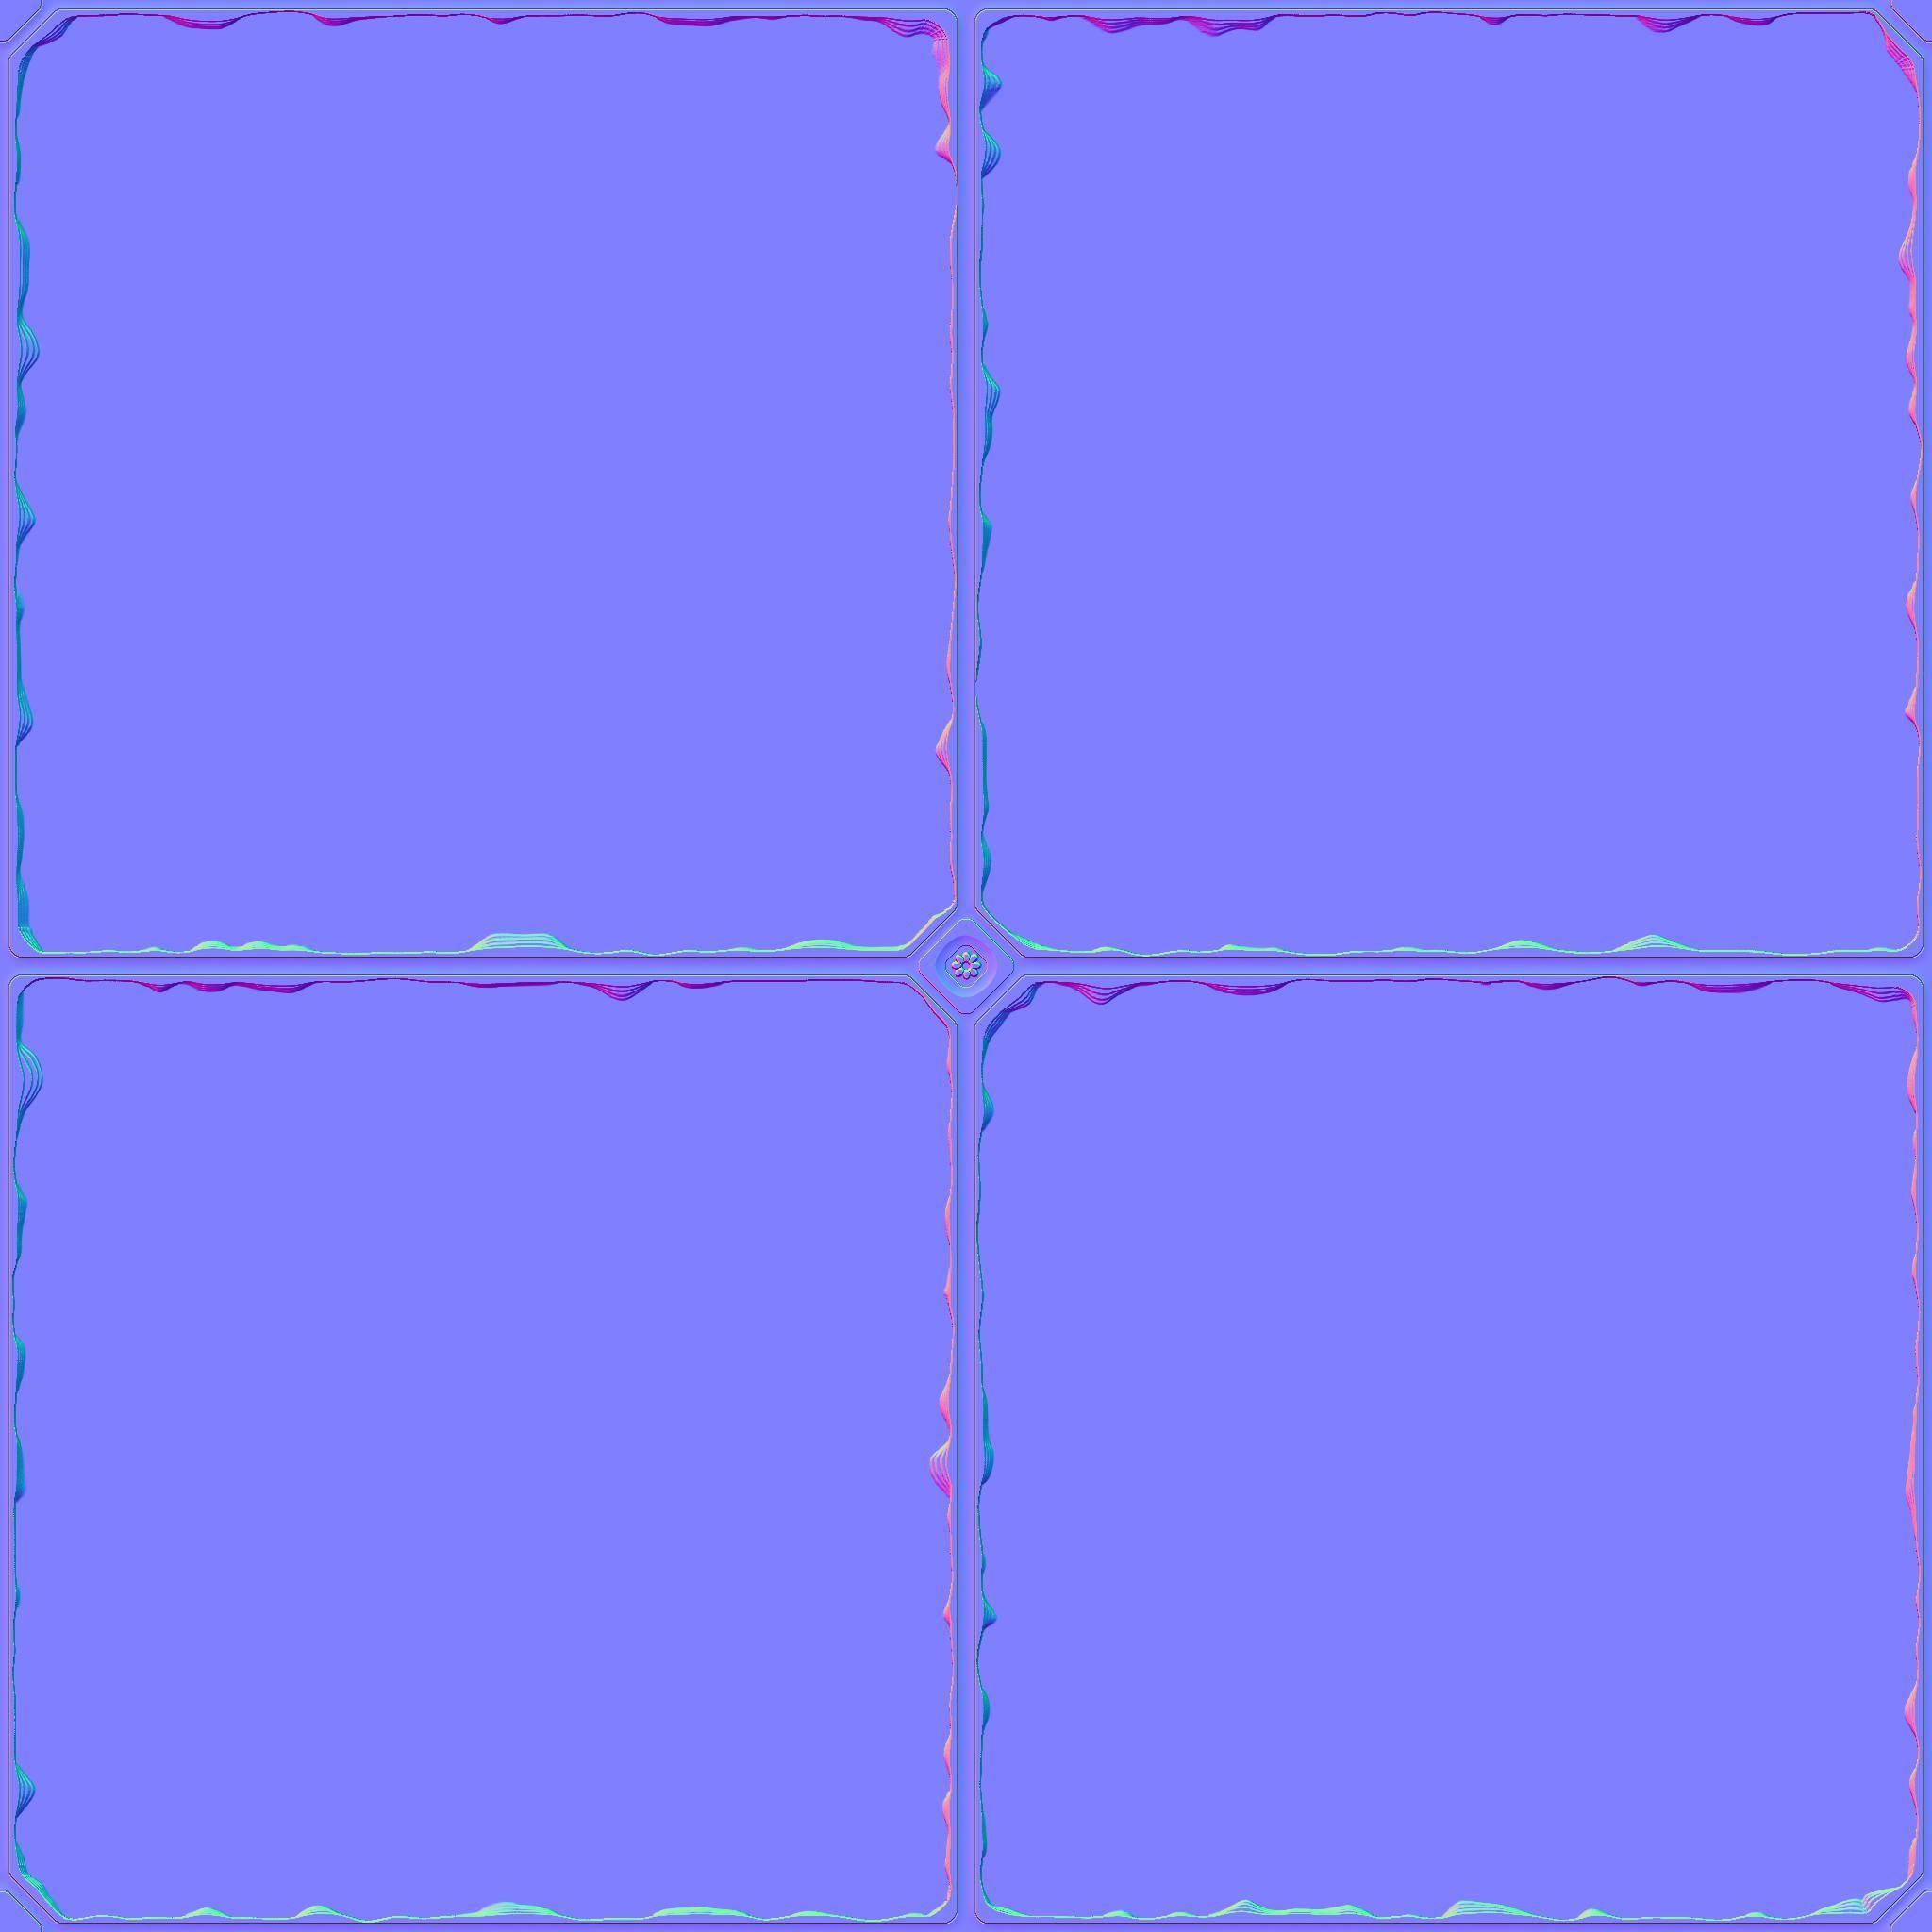 Normal map textures  Seamless tillable 4096 x 4096 texture very high